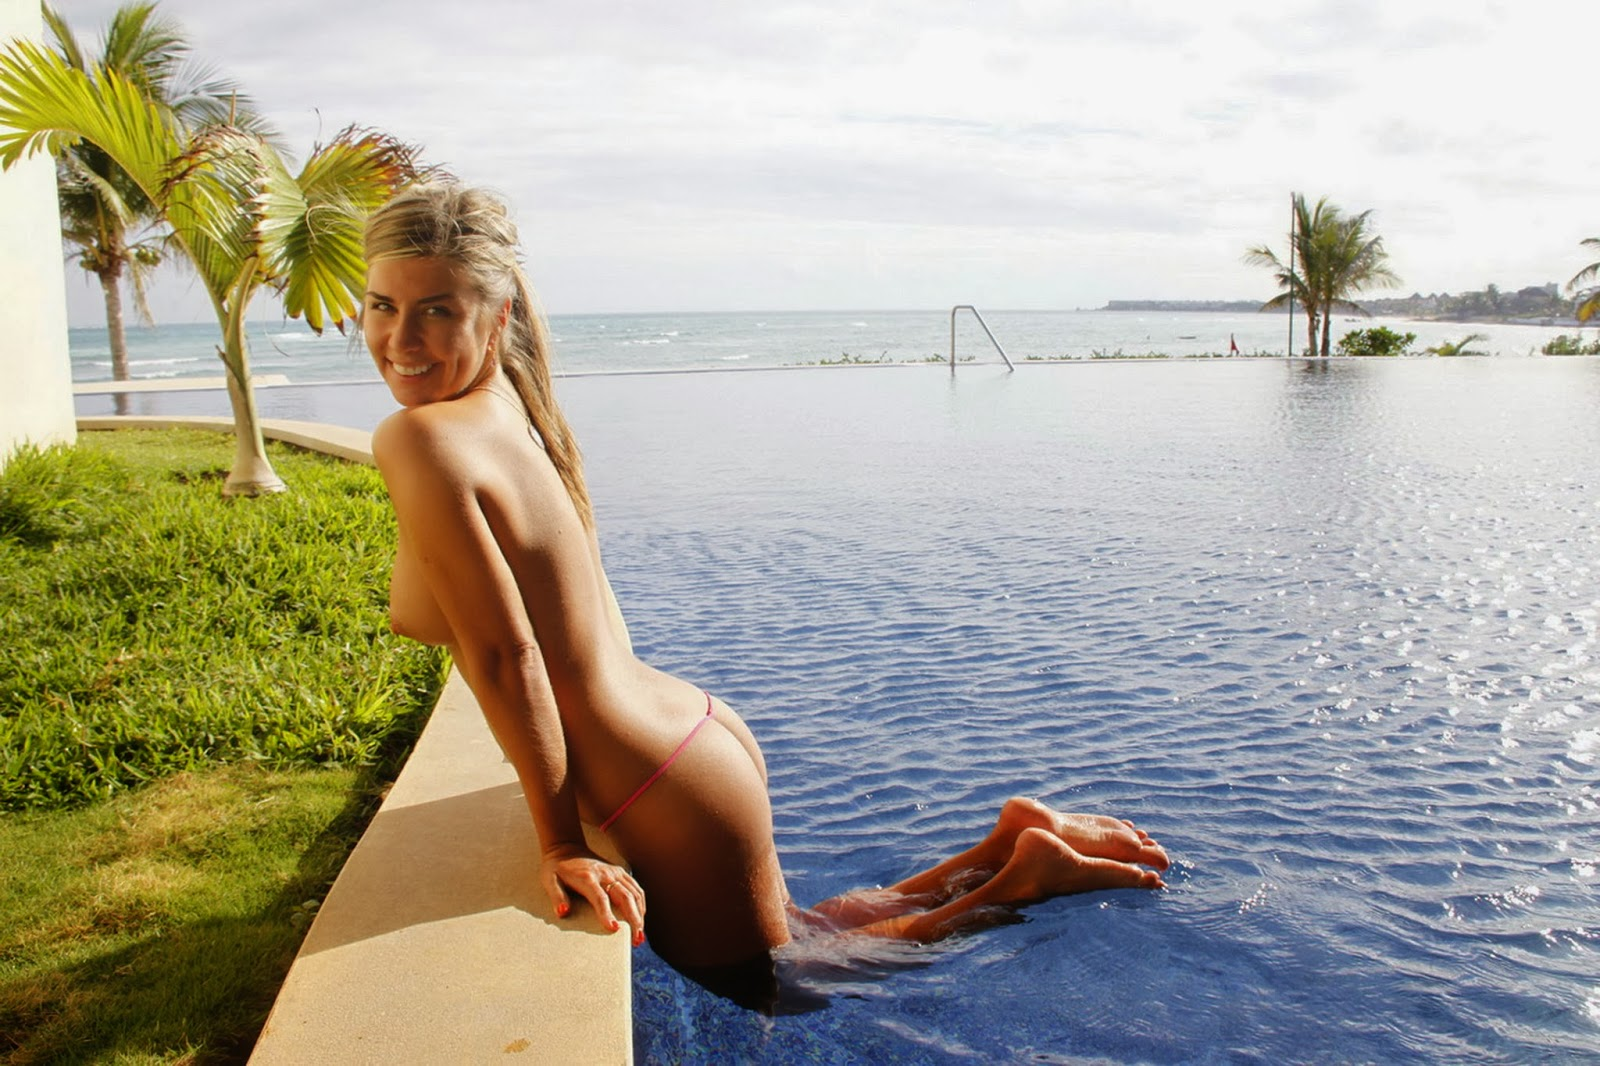 Basking in the sun in a nude shade bikini